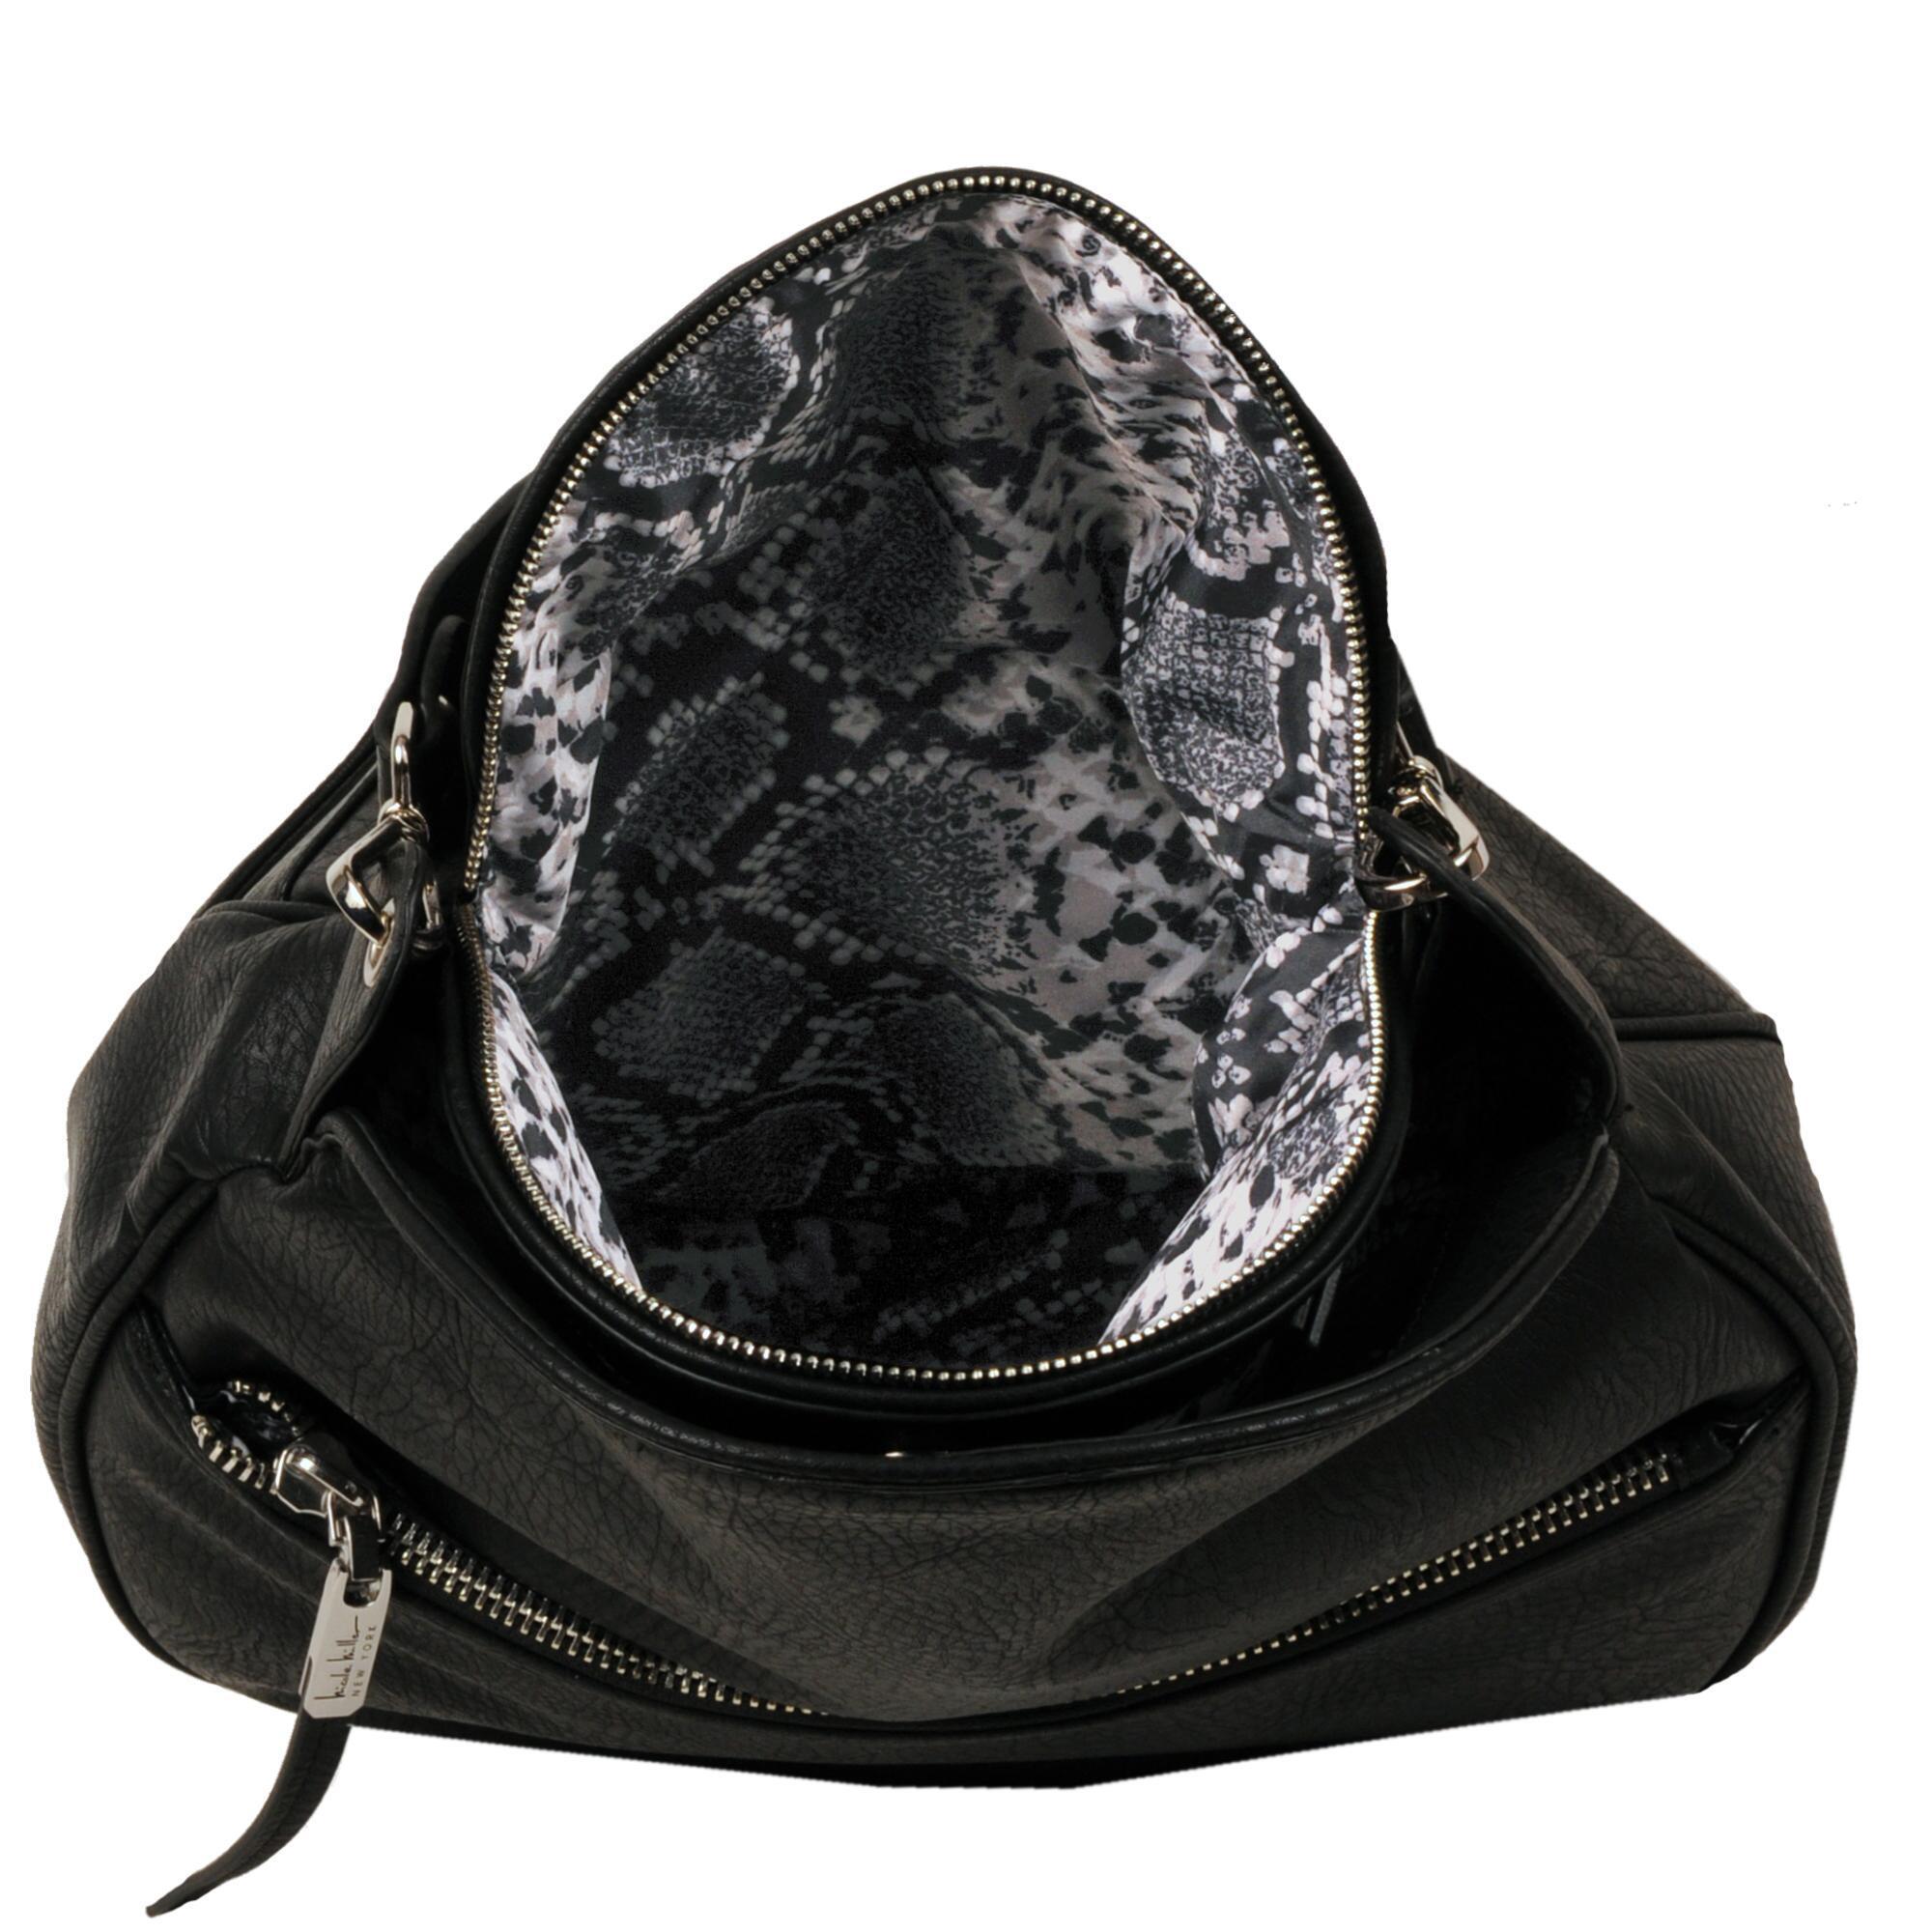 Wilsons Leather Black Nicole Miller Newport Hobo Faux Handbag Lyst View Fullscreen